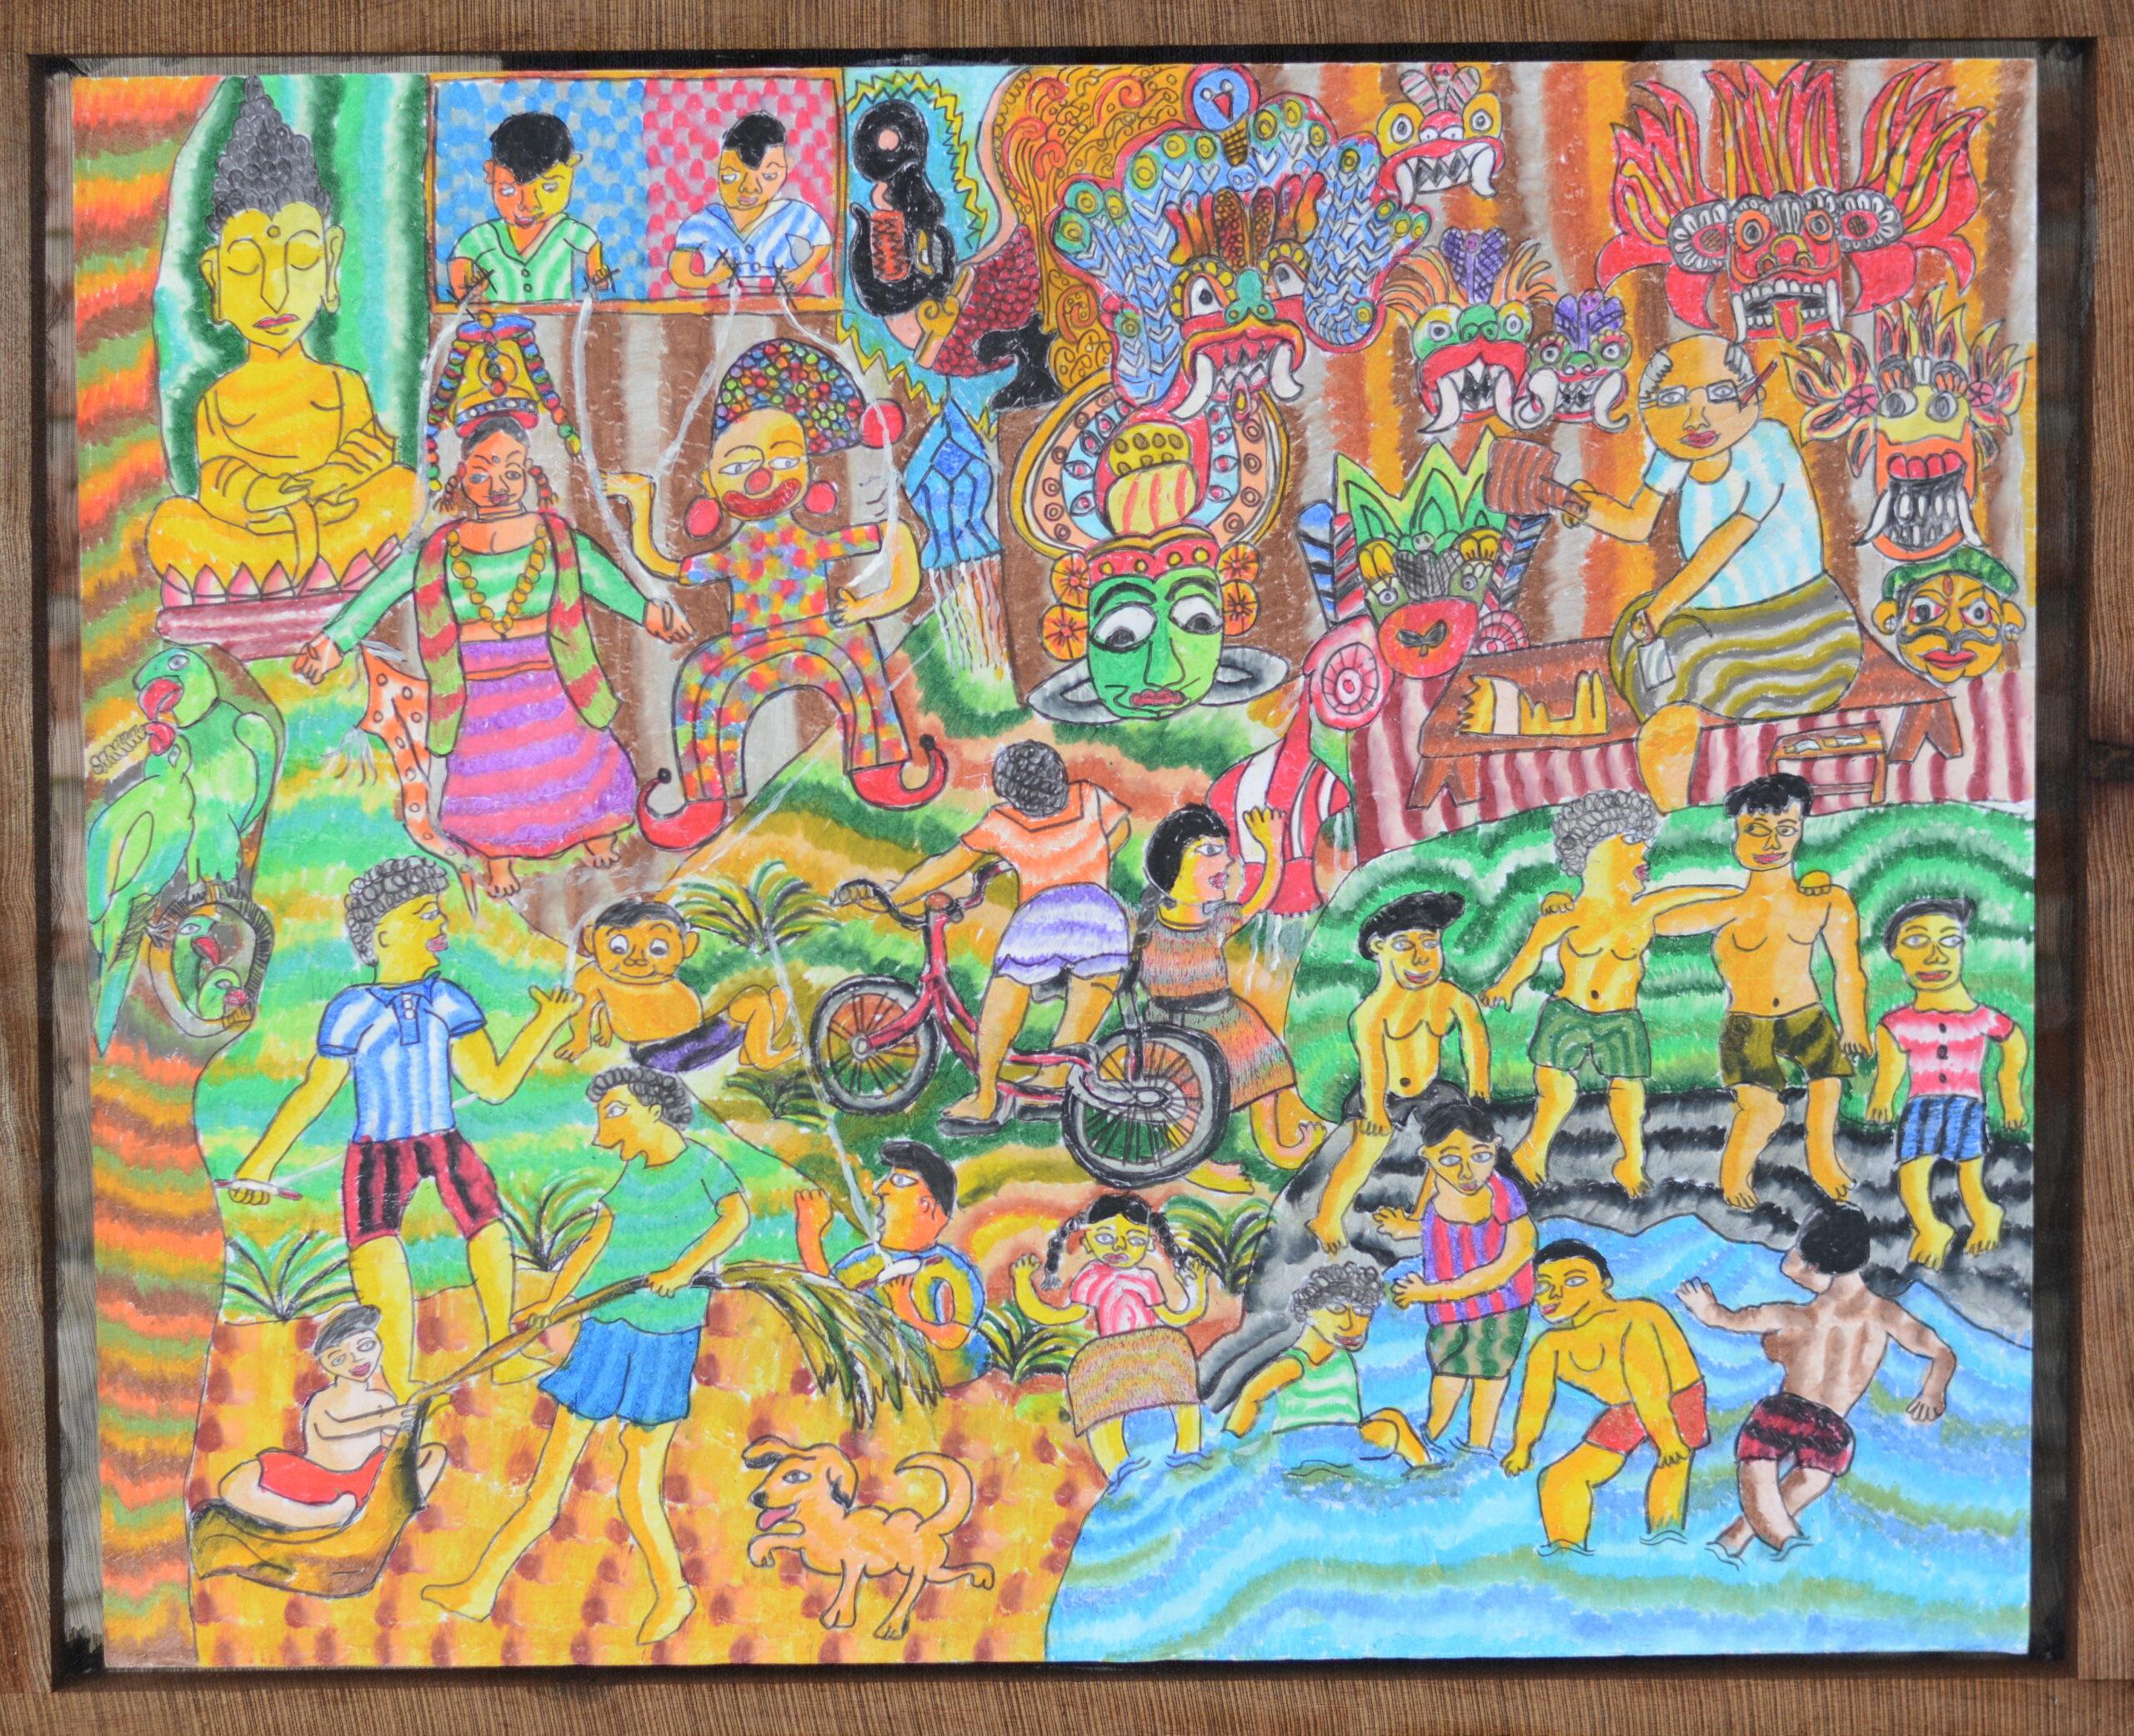 Ambalangoda, my place of origin!_T. W. Anuga Vihas Wijerathne